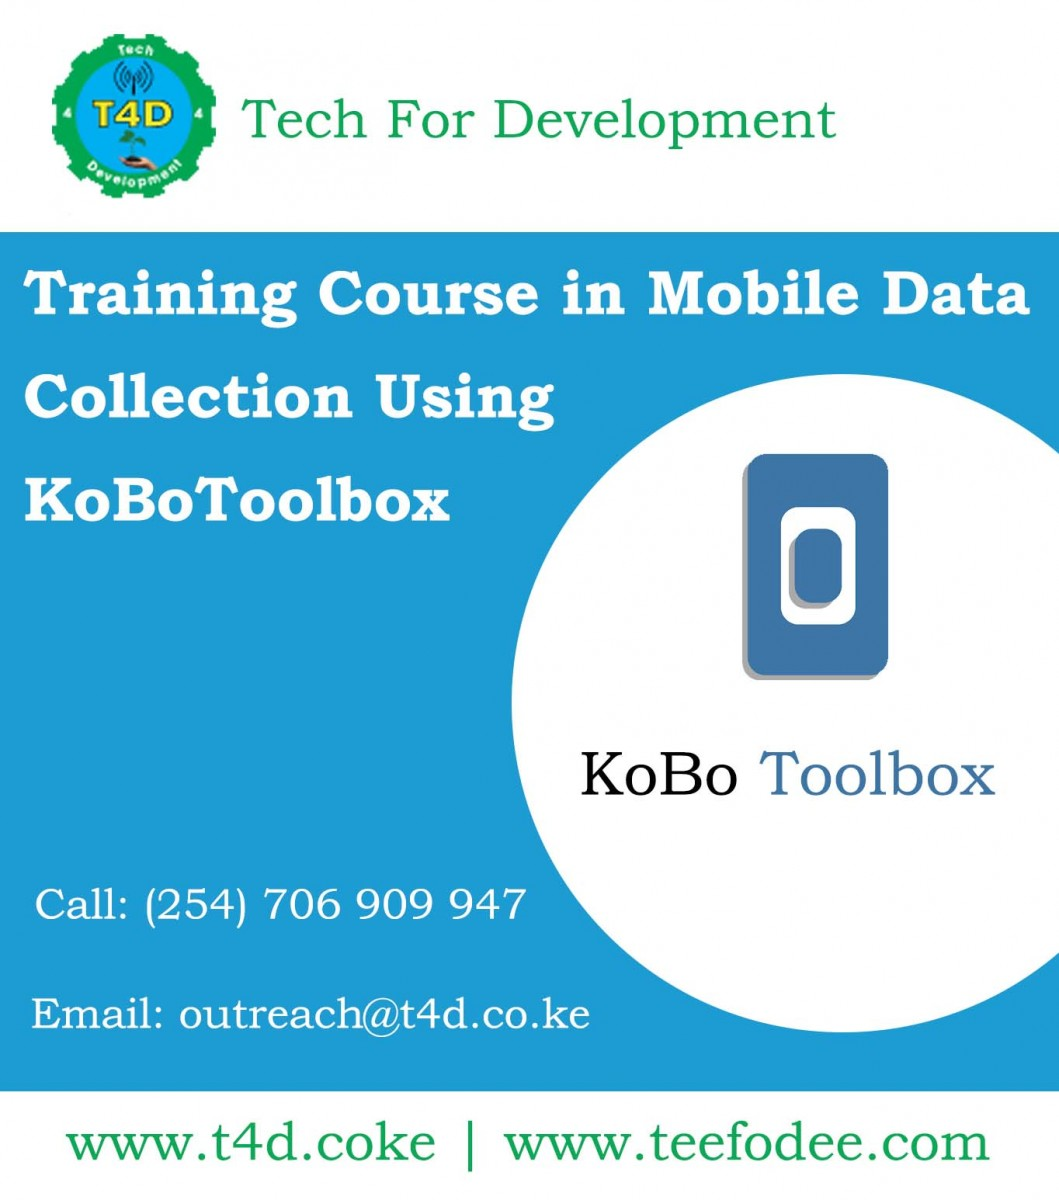 t4d_kobotoolbox_banner